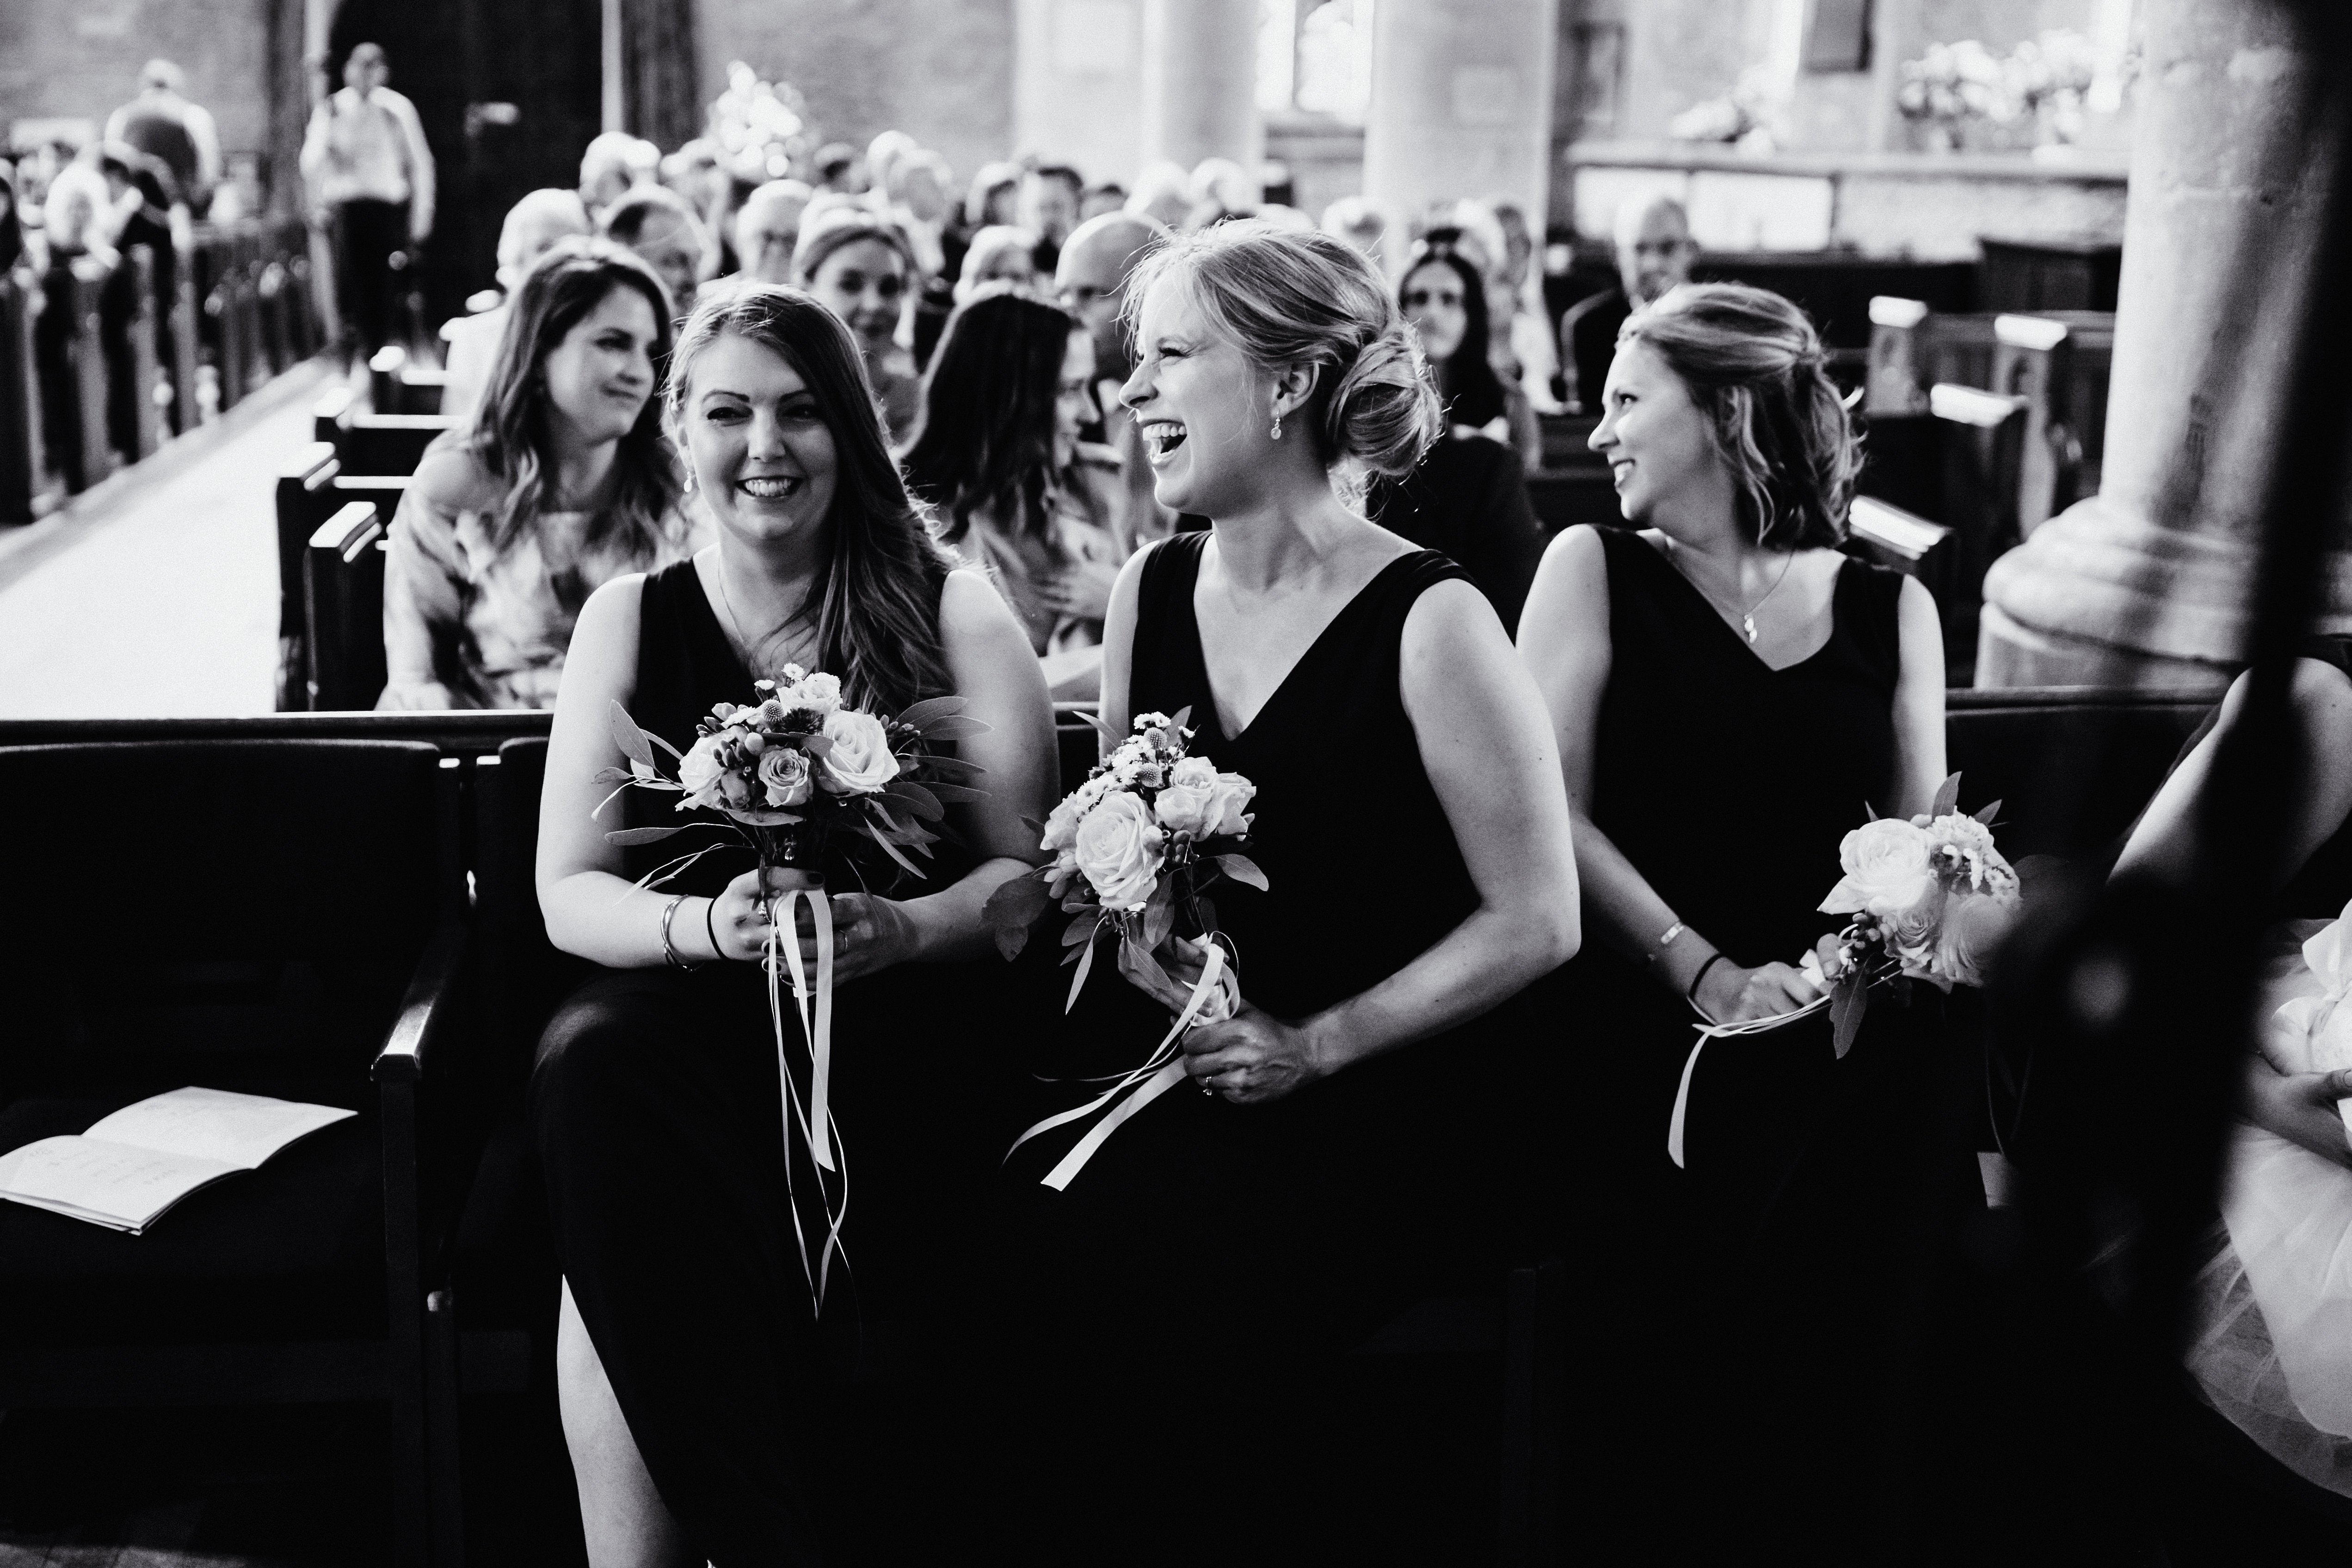 documentay wedding photography